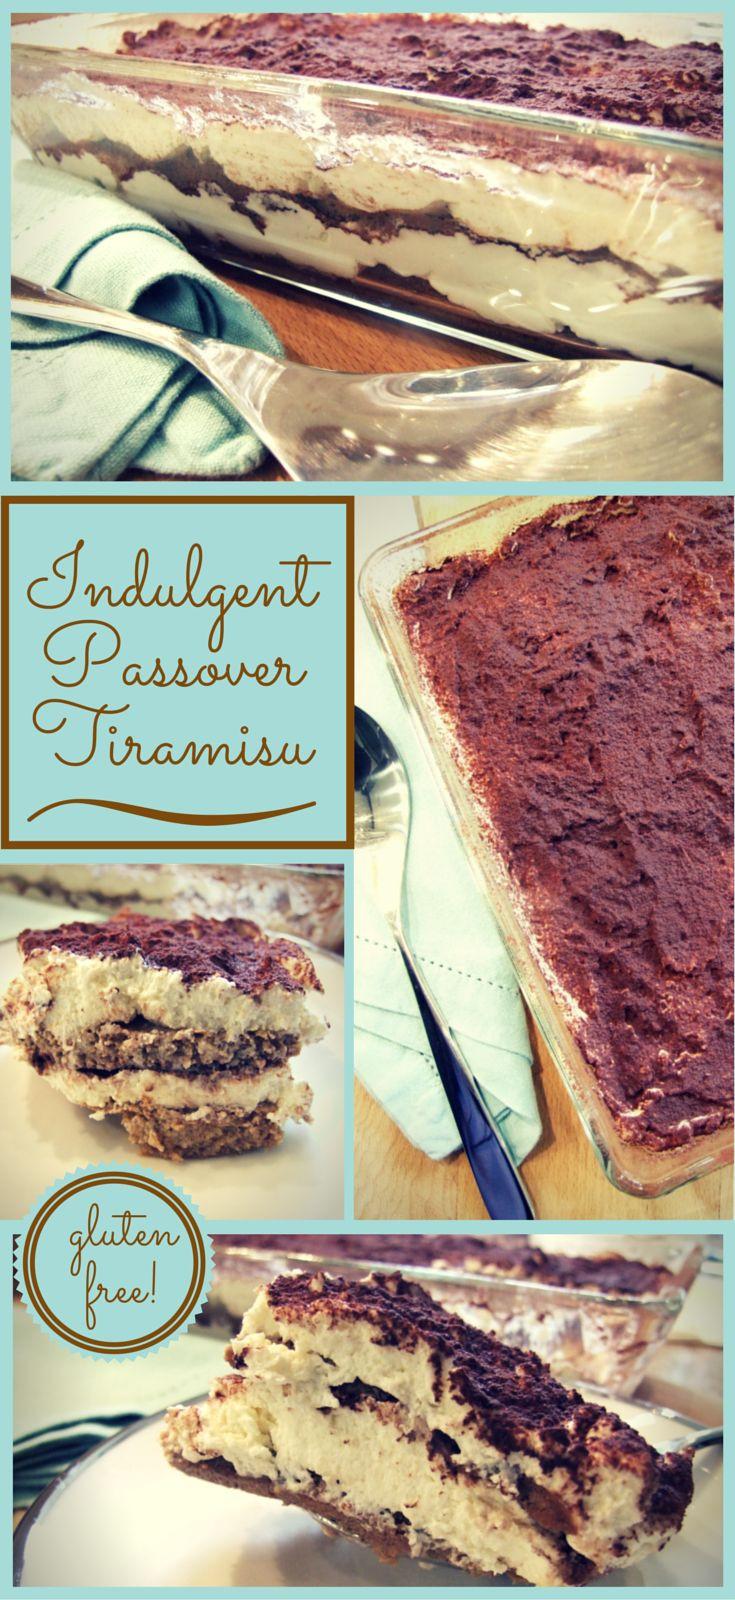 Gluten Free Passover Recipes  Indulgent Pesach tiramisu gluten free passover dessert